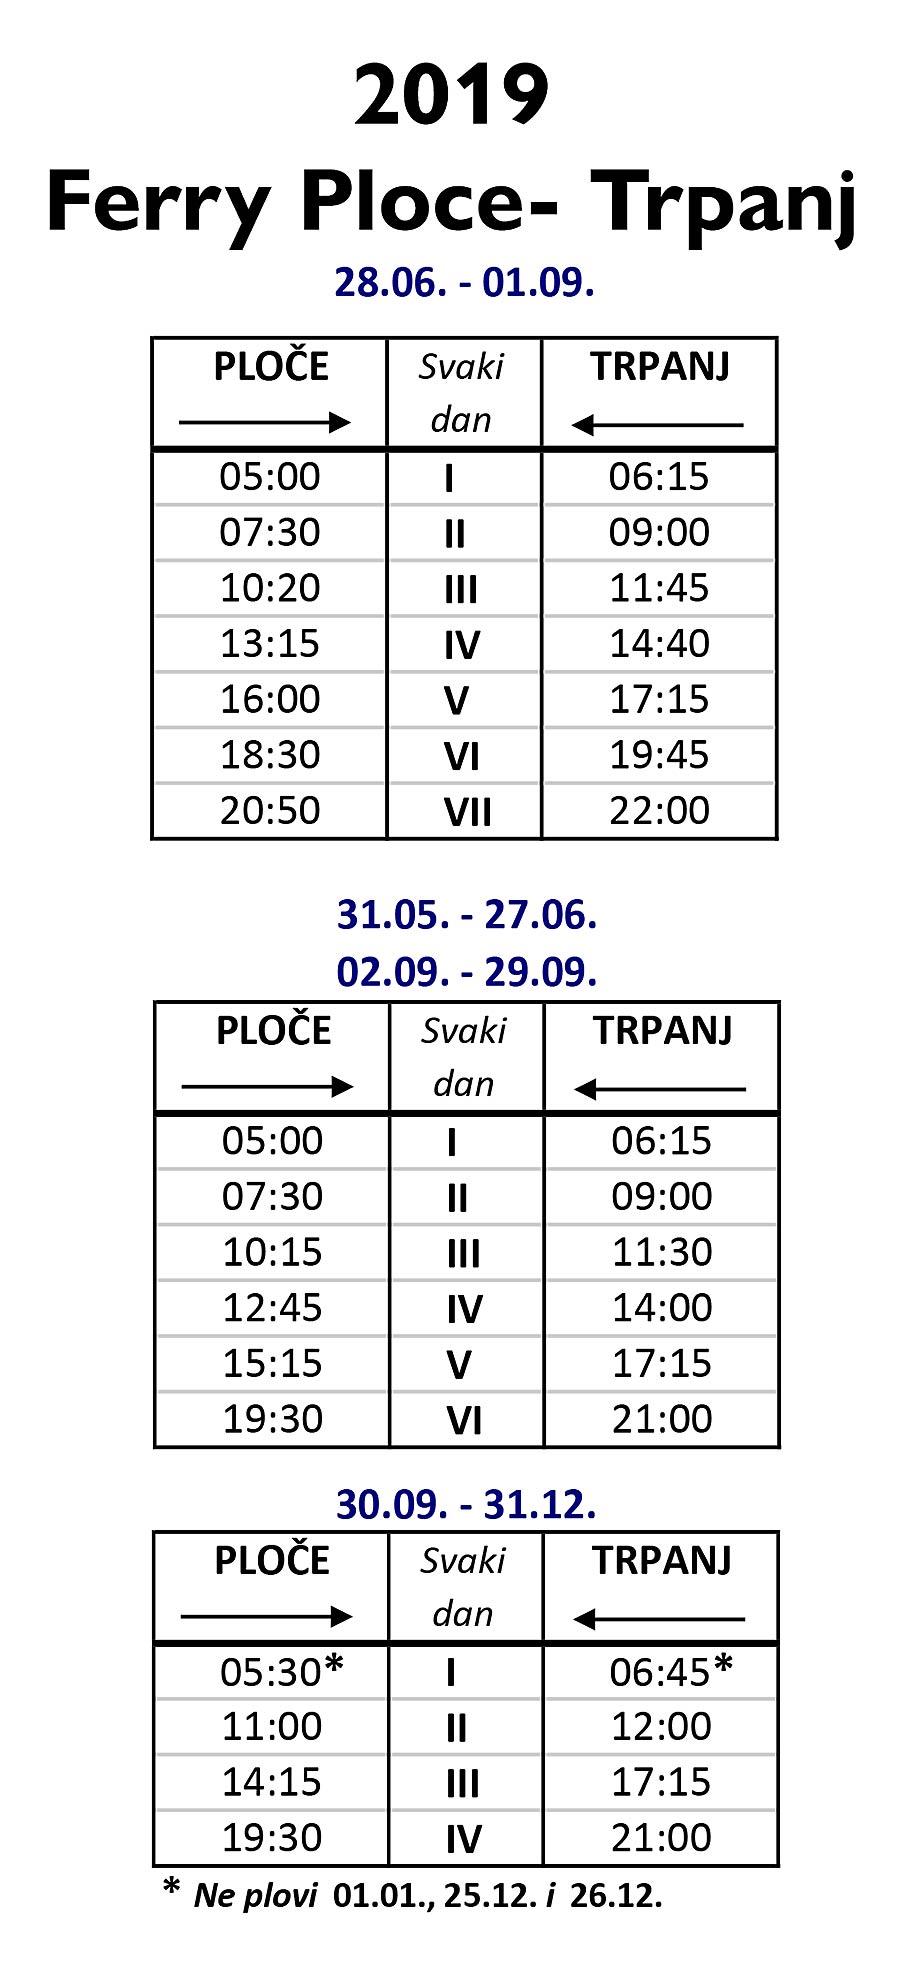 Ploce - Trpanj Ferry Timetable